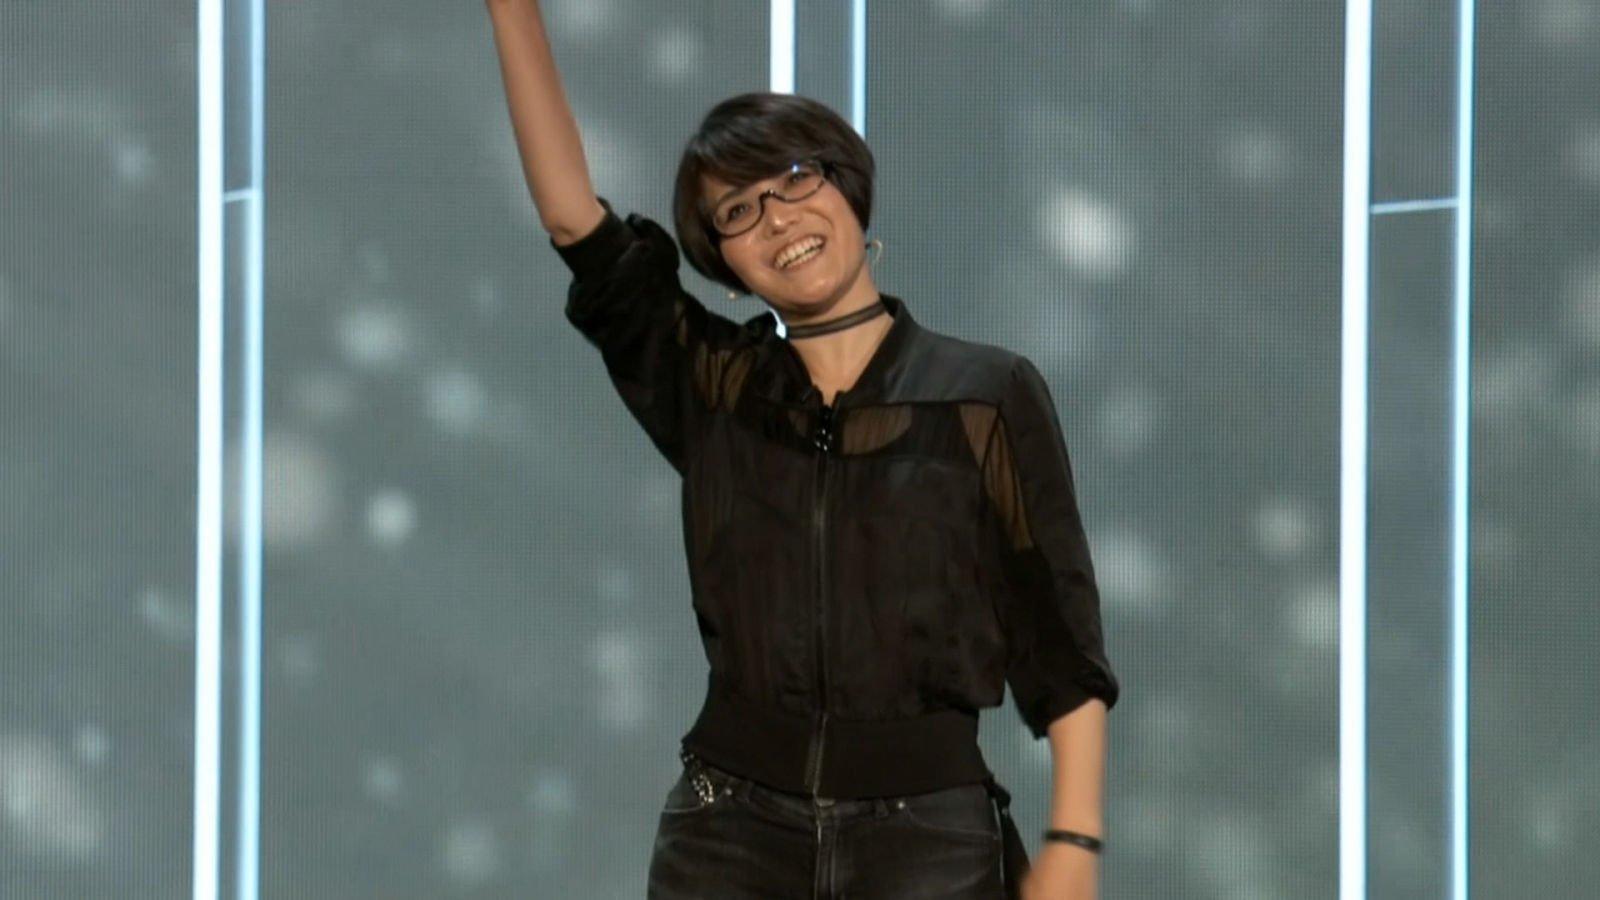 Ikumi Nakamura ya no trabaja en GhostWire: Tokyo, y se marcha de Tango GameWorks